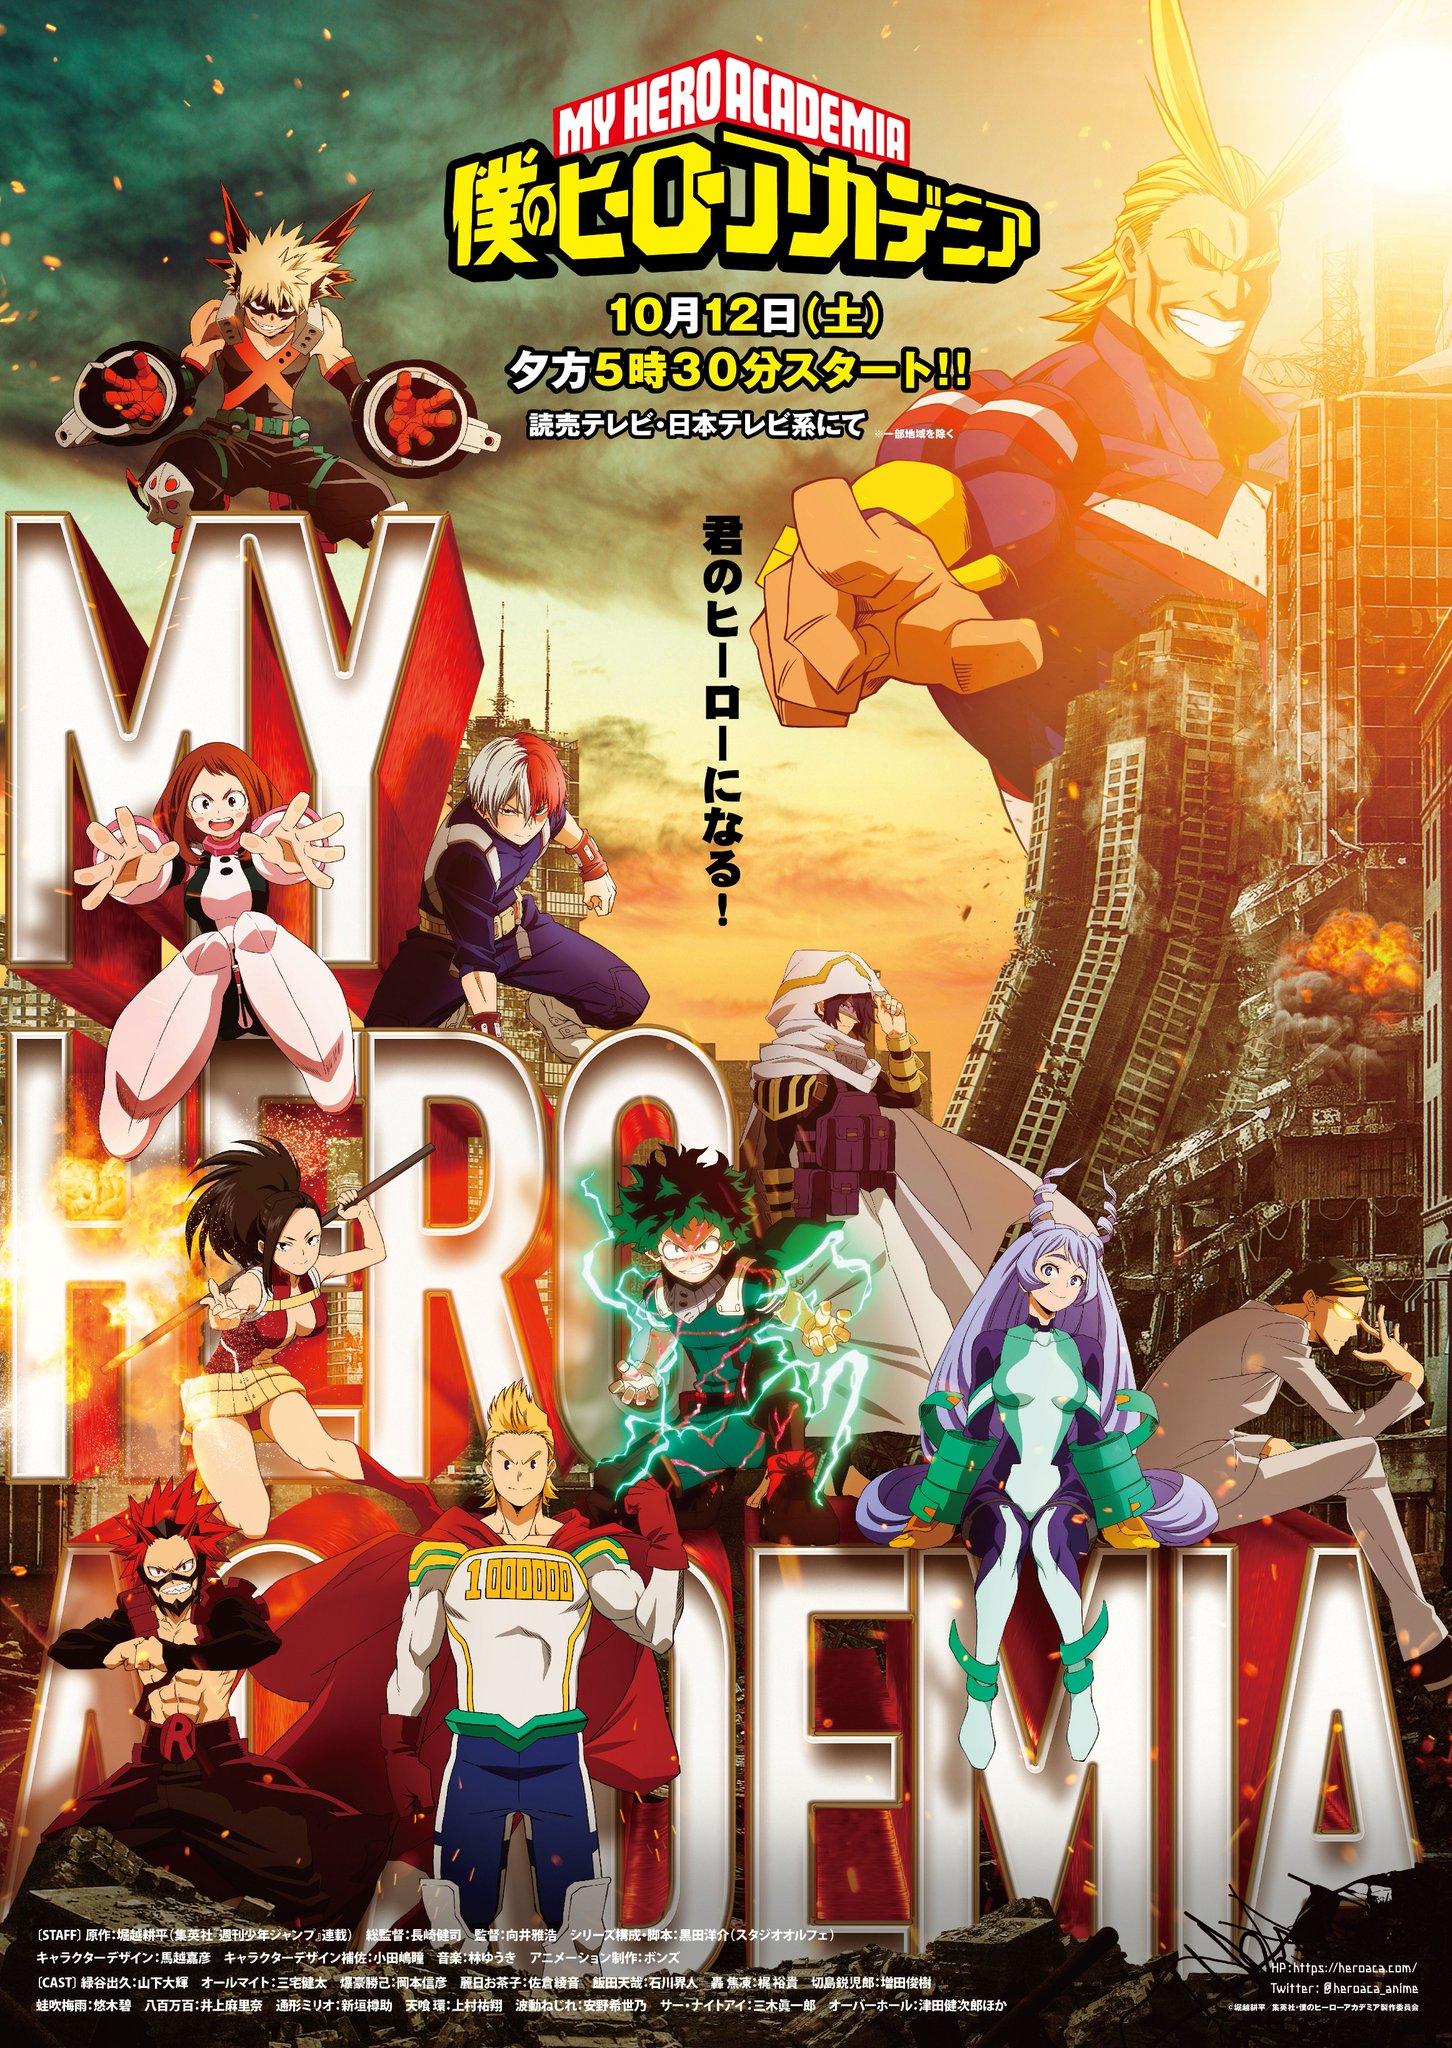 My Hero Academia Season 4 | My Hero Academia Wiki | Fandom